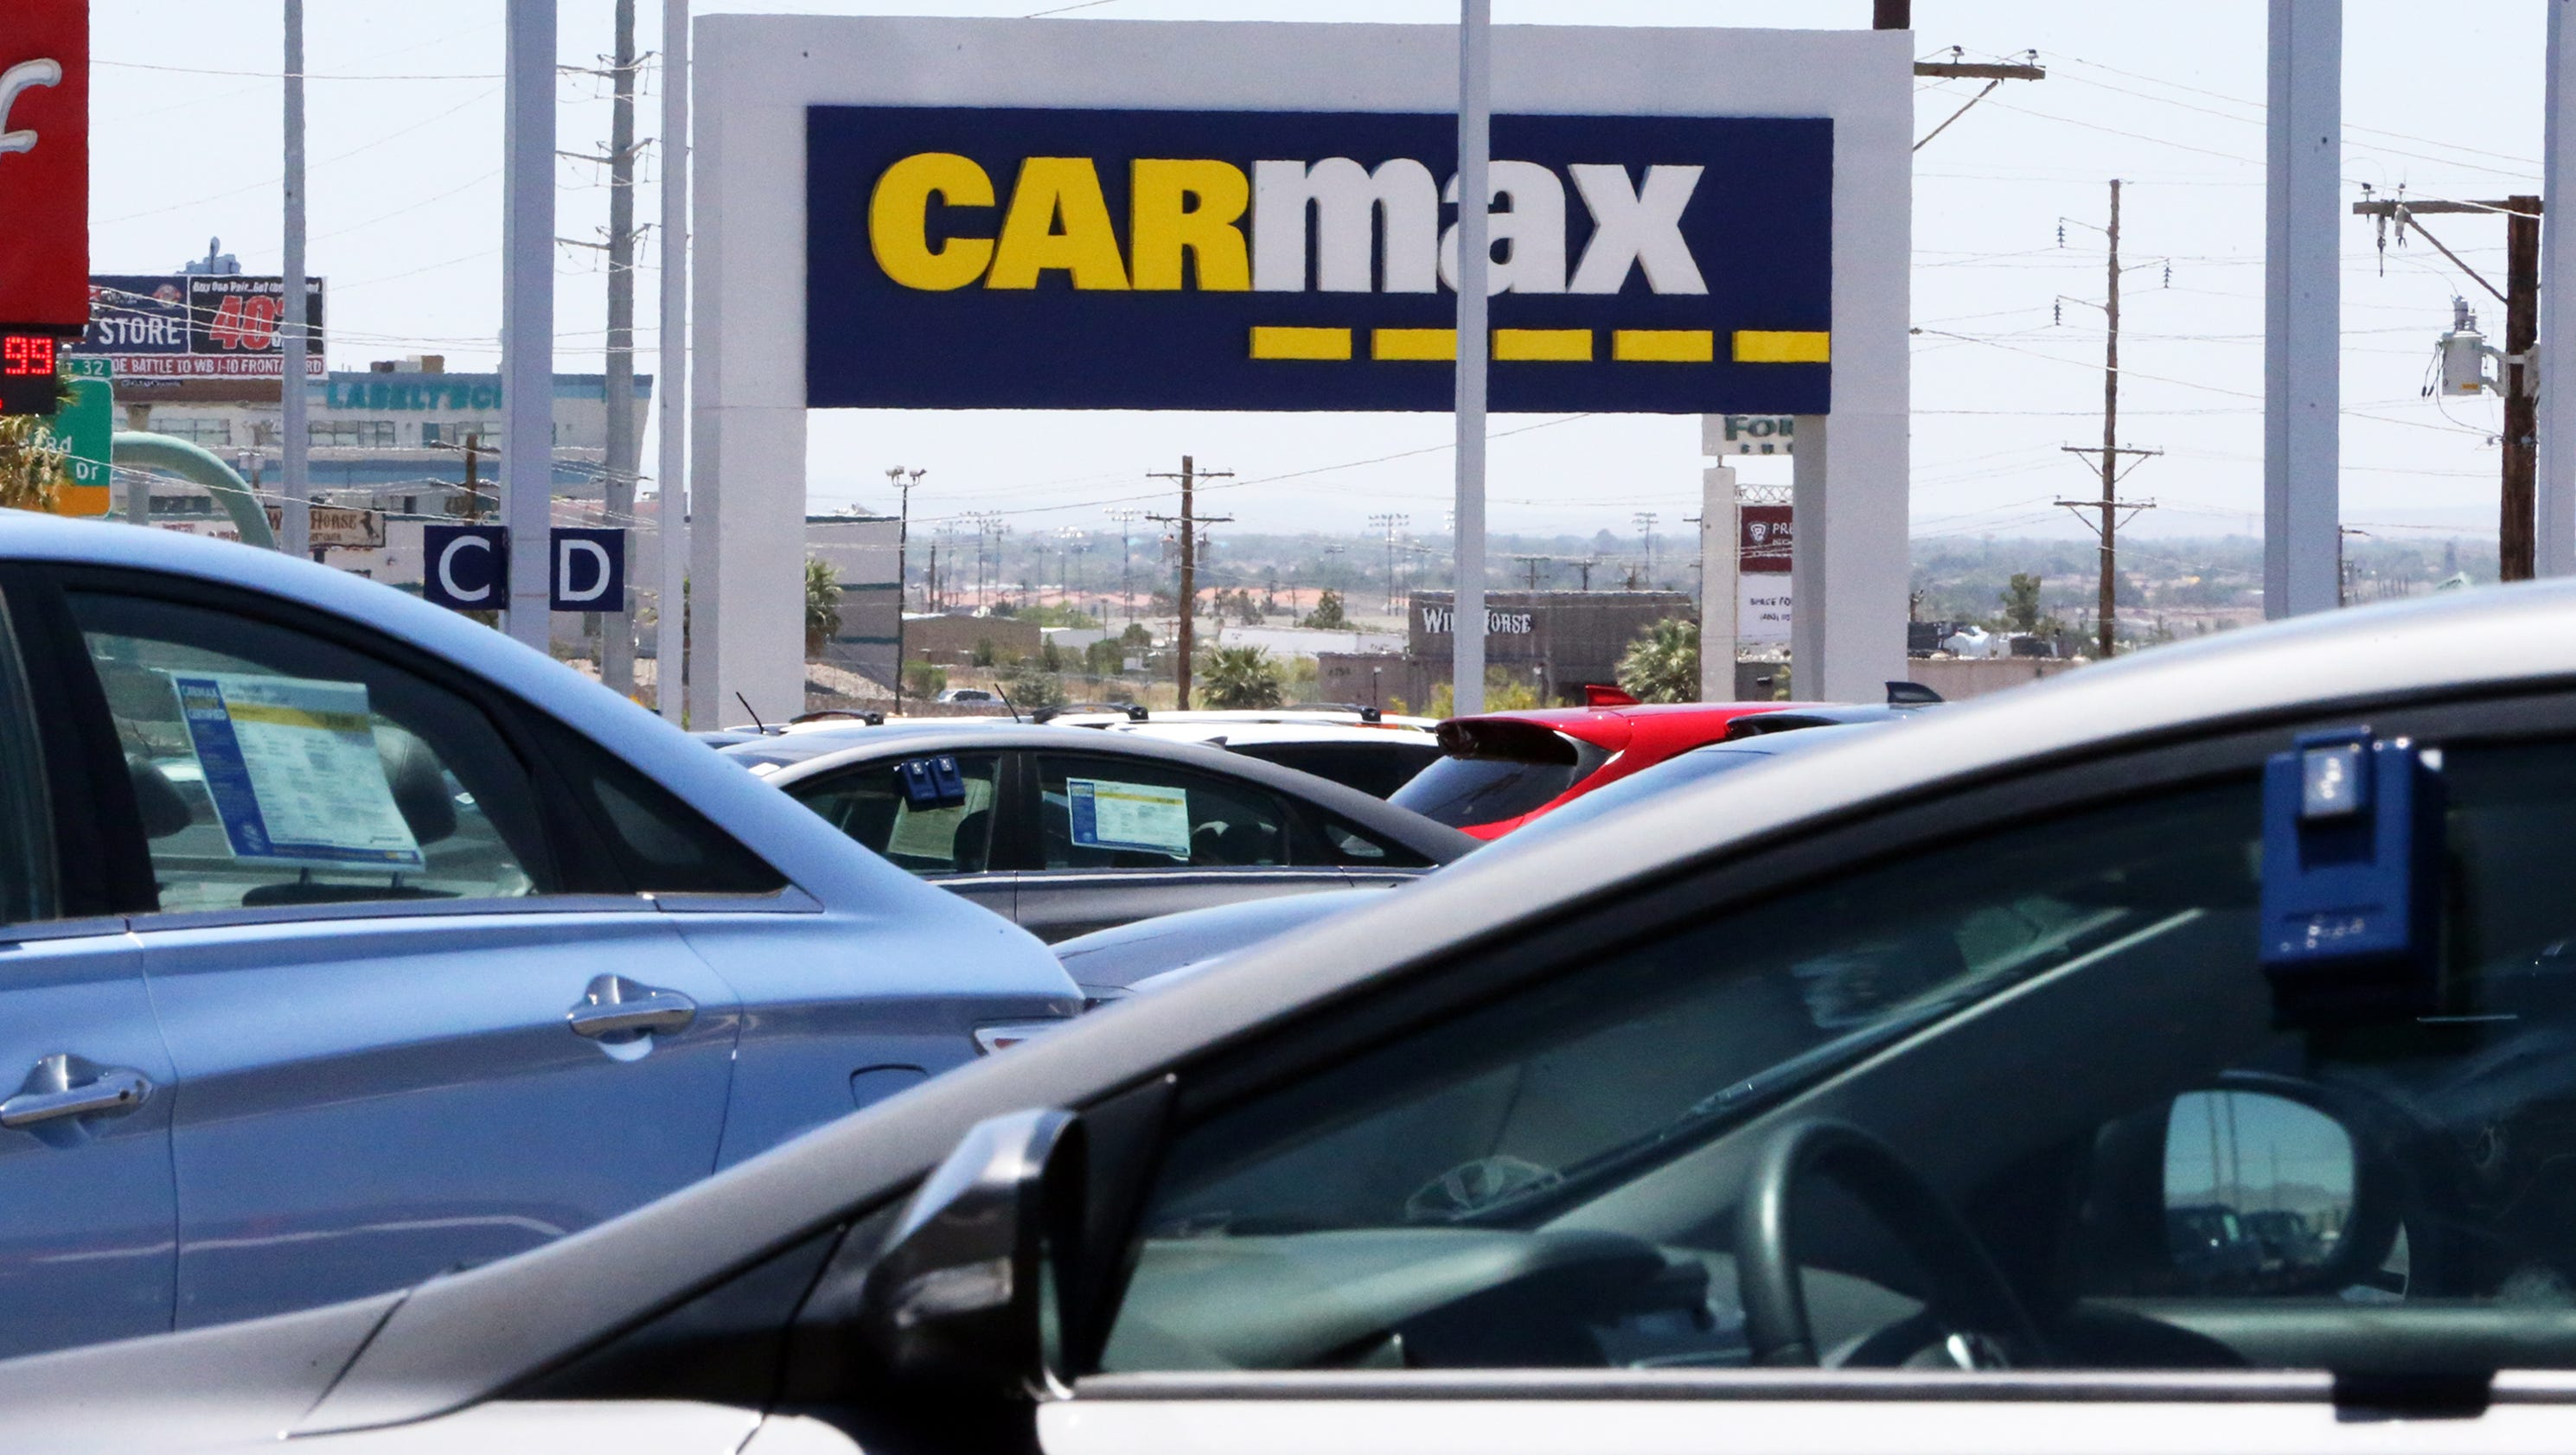 Carmax El Paso Used Cars